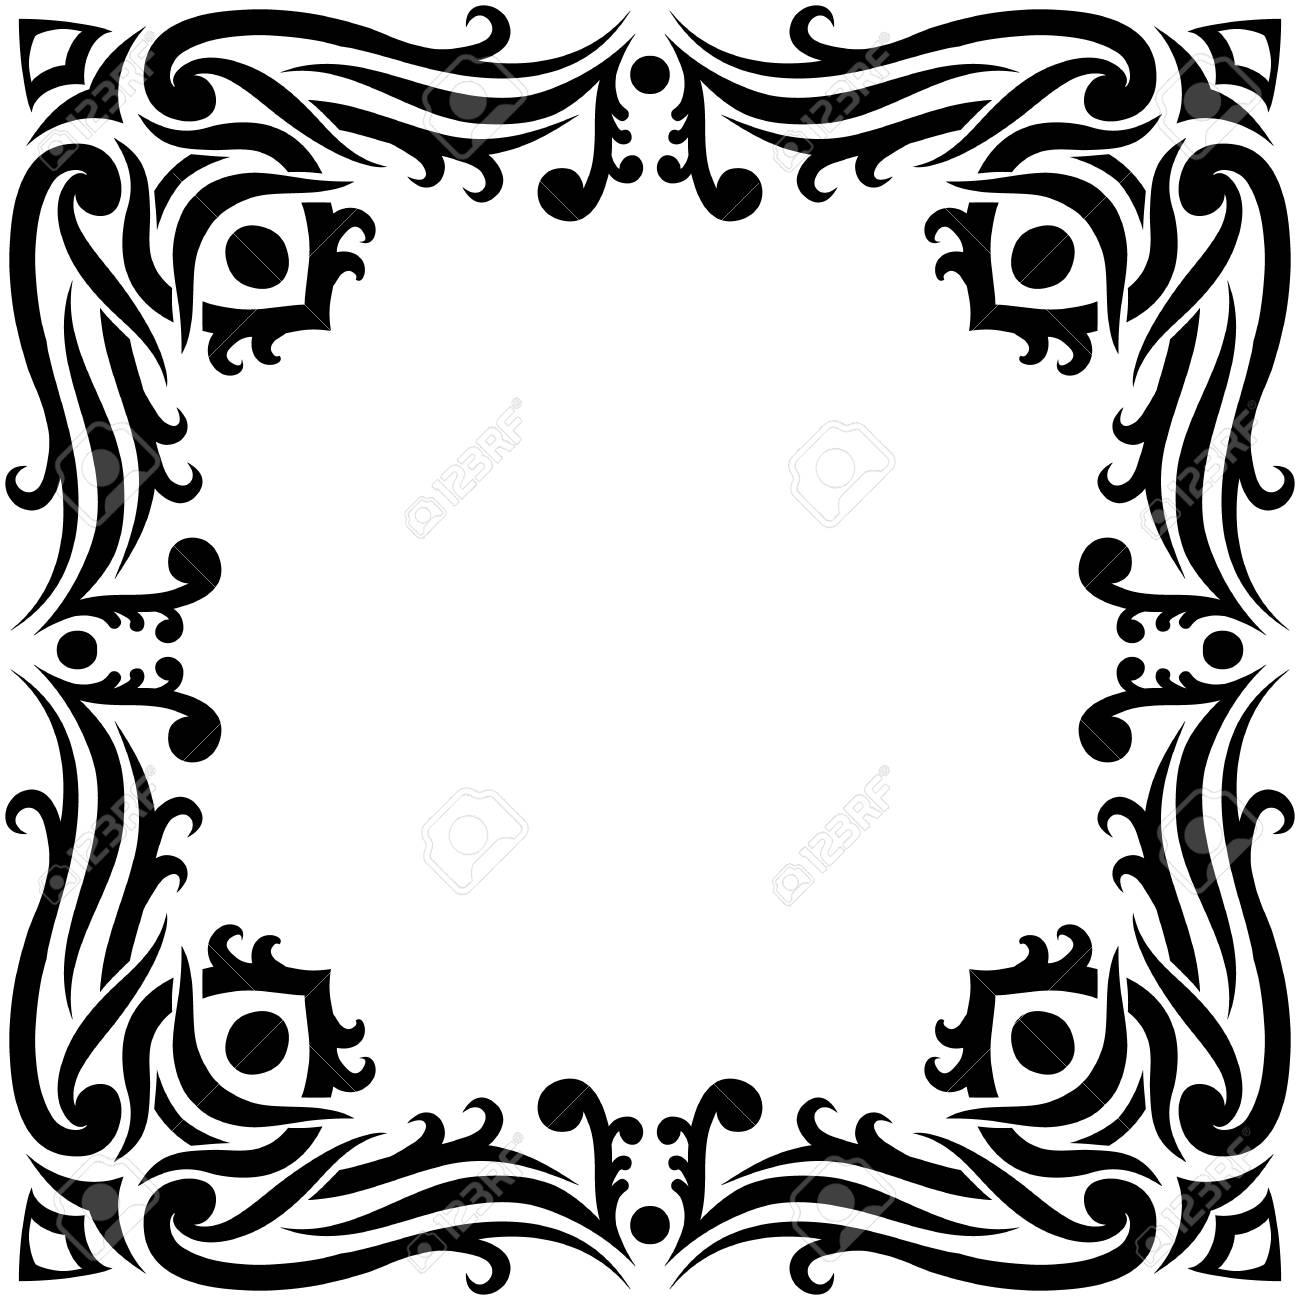 Vector border frame in black color oriental motives vintage vector vector border frame in black color oriental motives vintage filigree can be used for invitation advertisement tattoo design etc stopboris Images